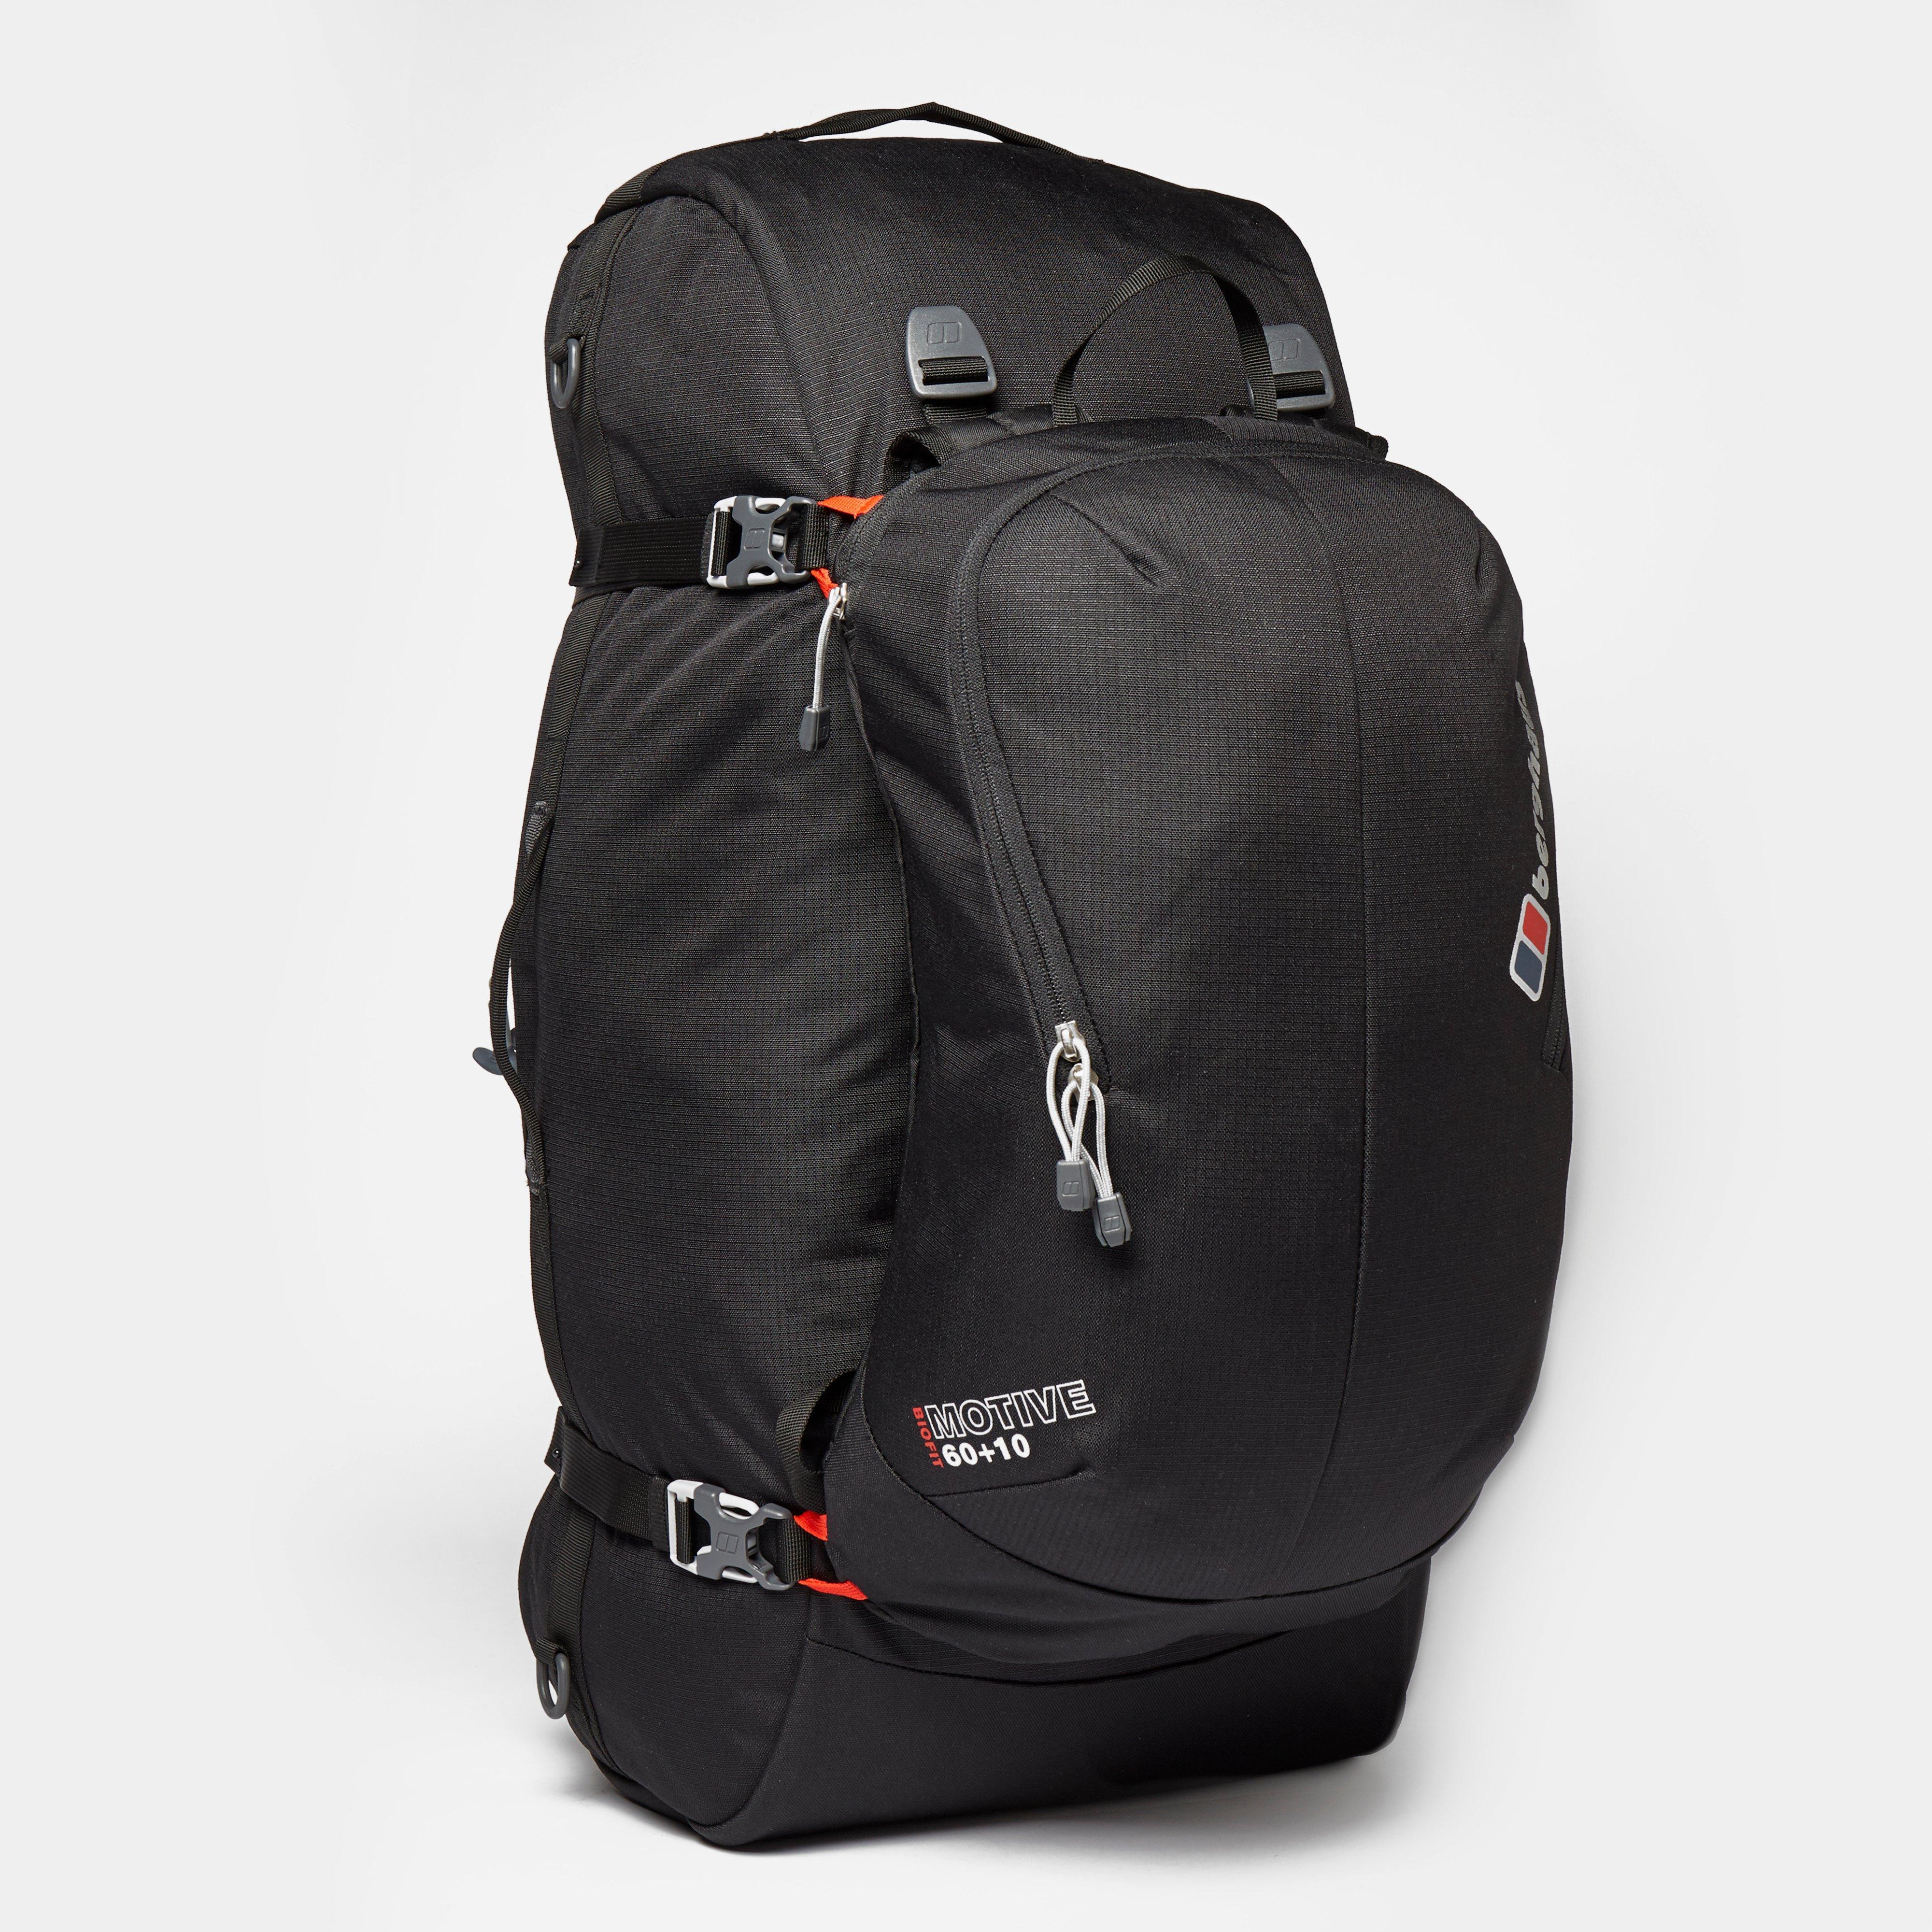 Berghaus Motive 6010 Rucksack  Black Black